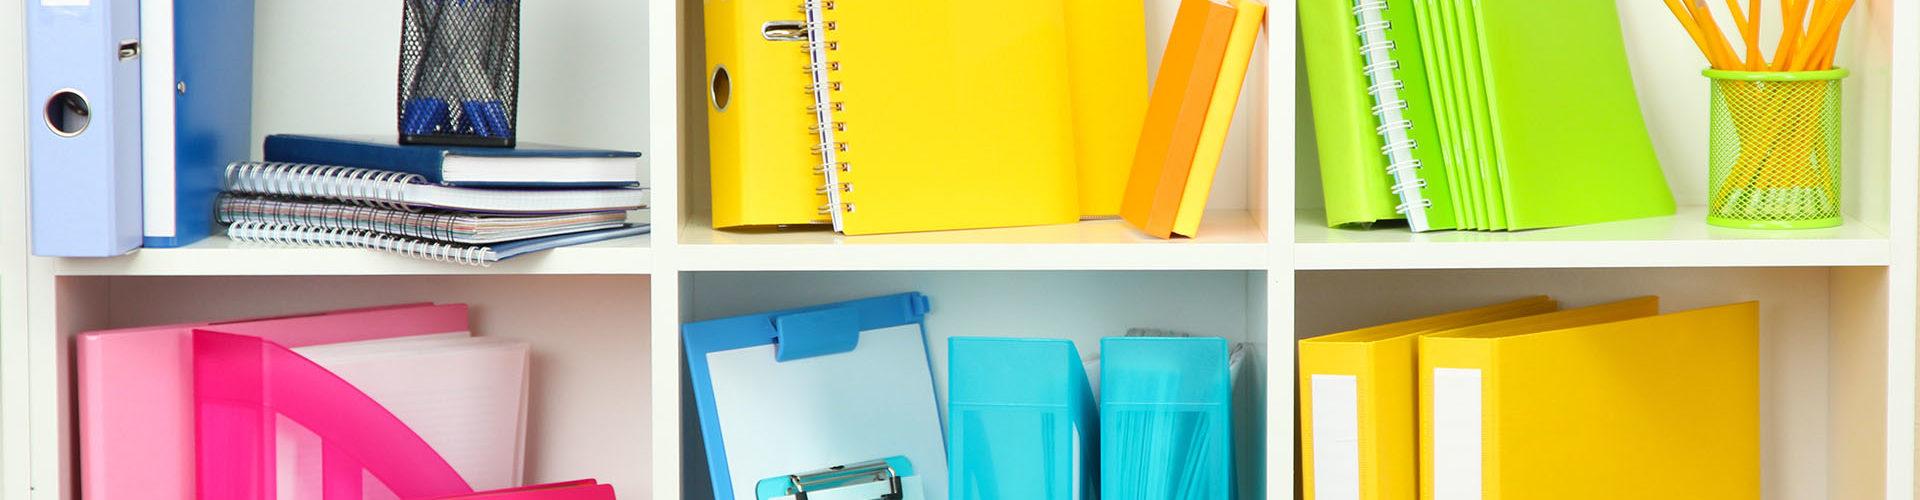 white bookshelf yellow blue pink binders school supplies